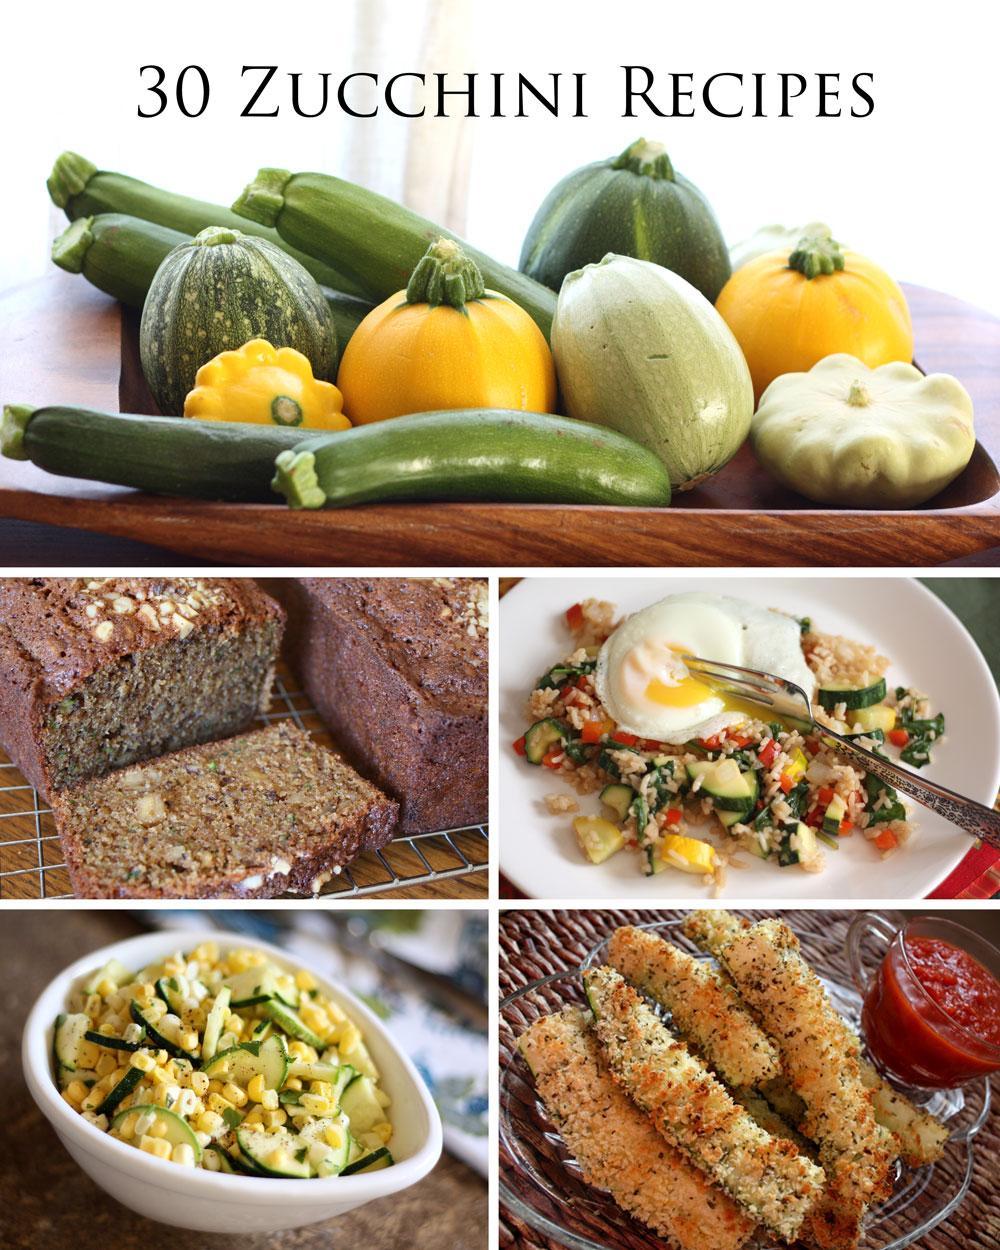 Barefeet In The Kitchen: Summer Squash: 30 Zucchini Recipes